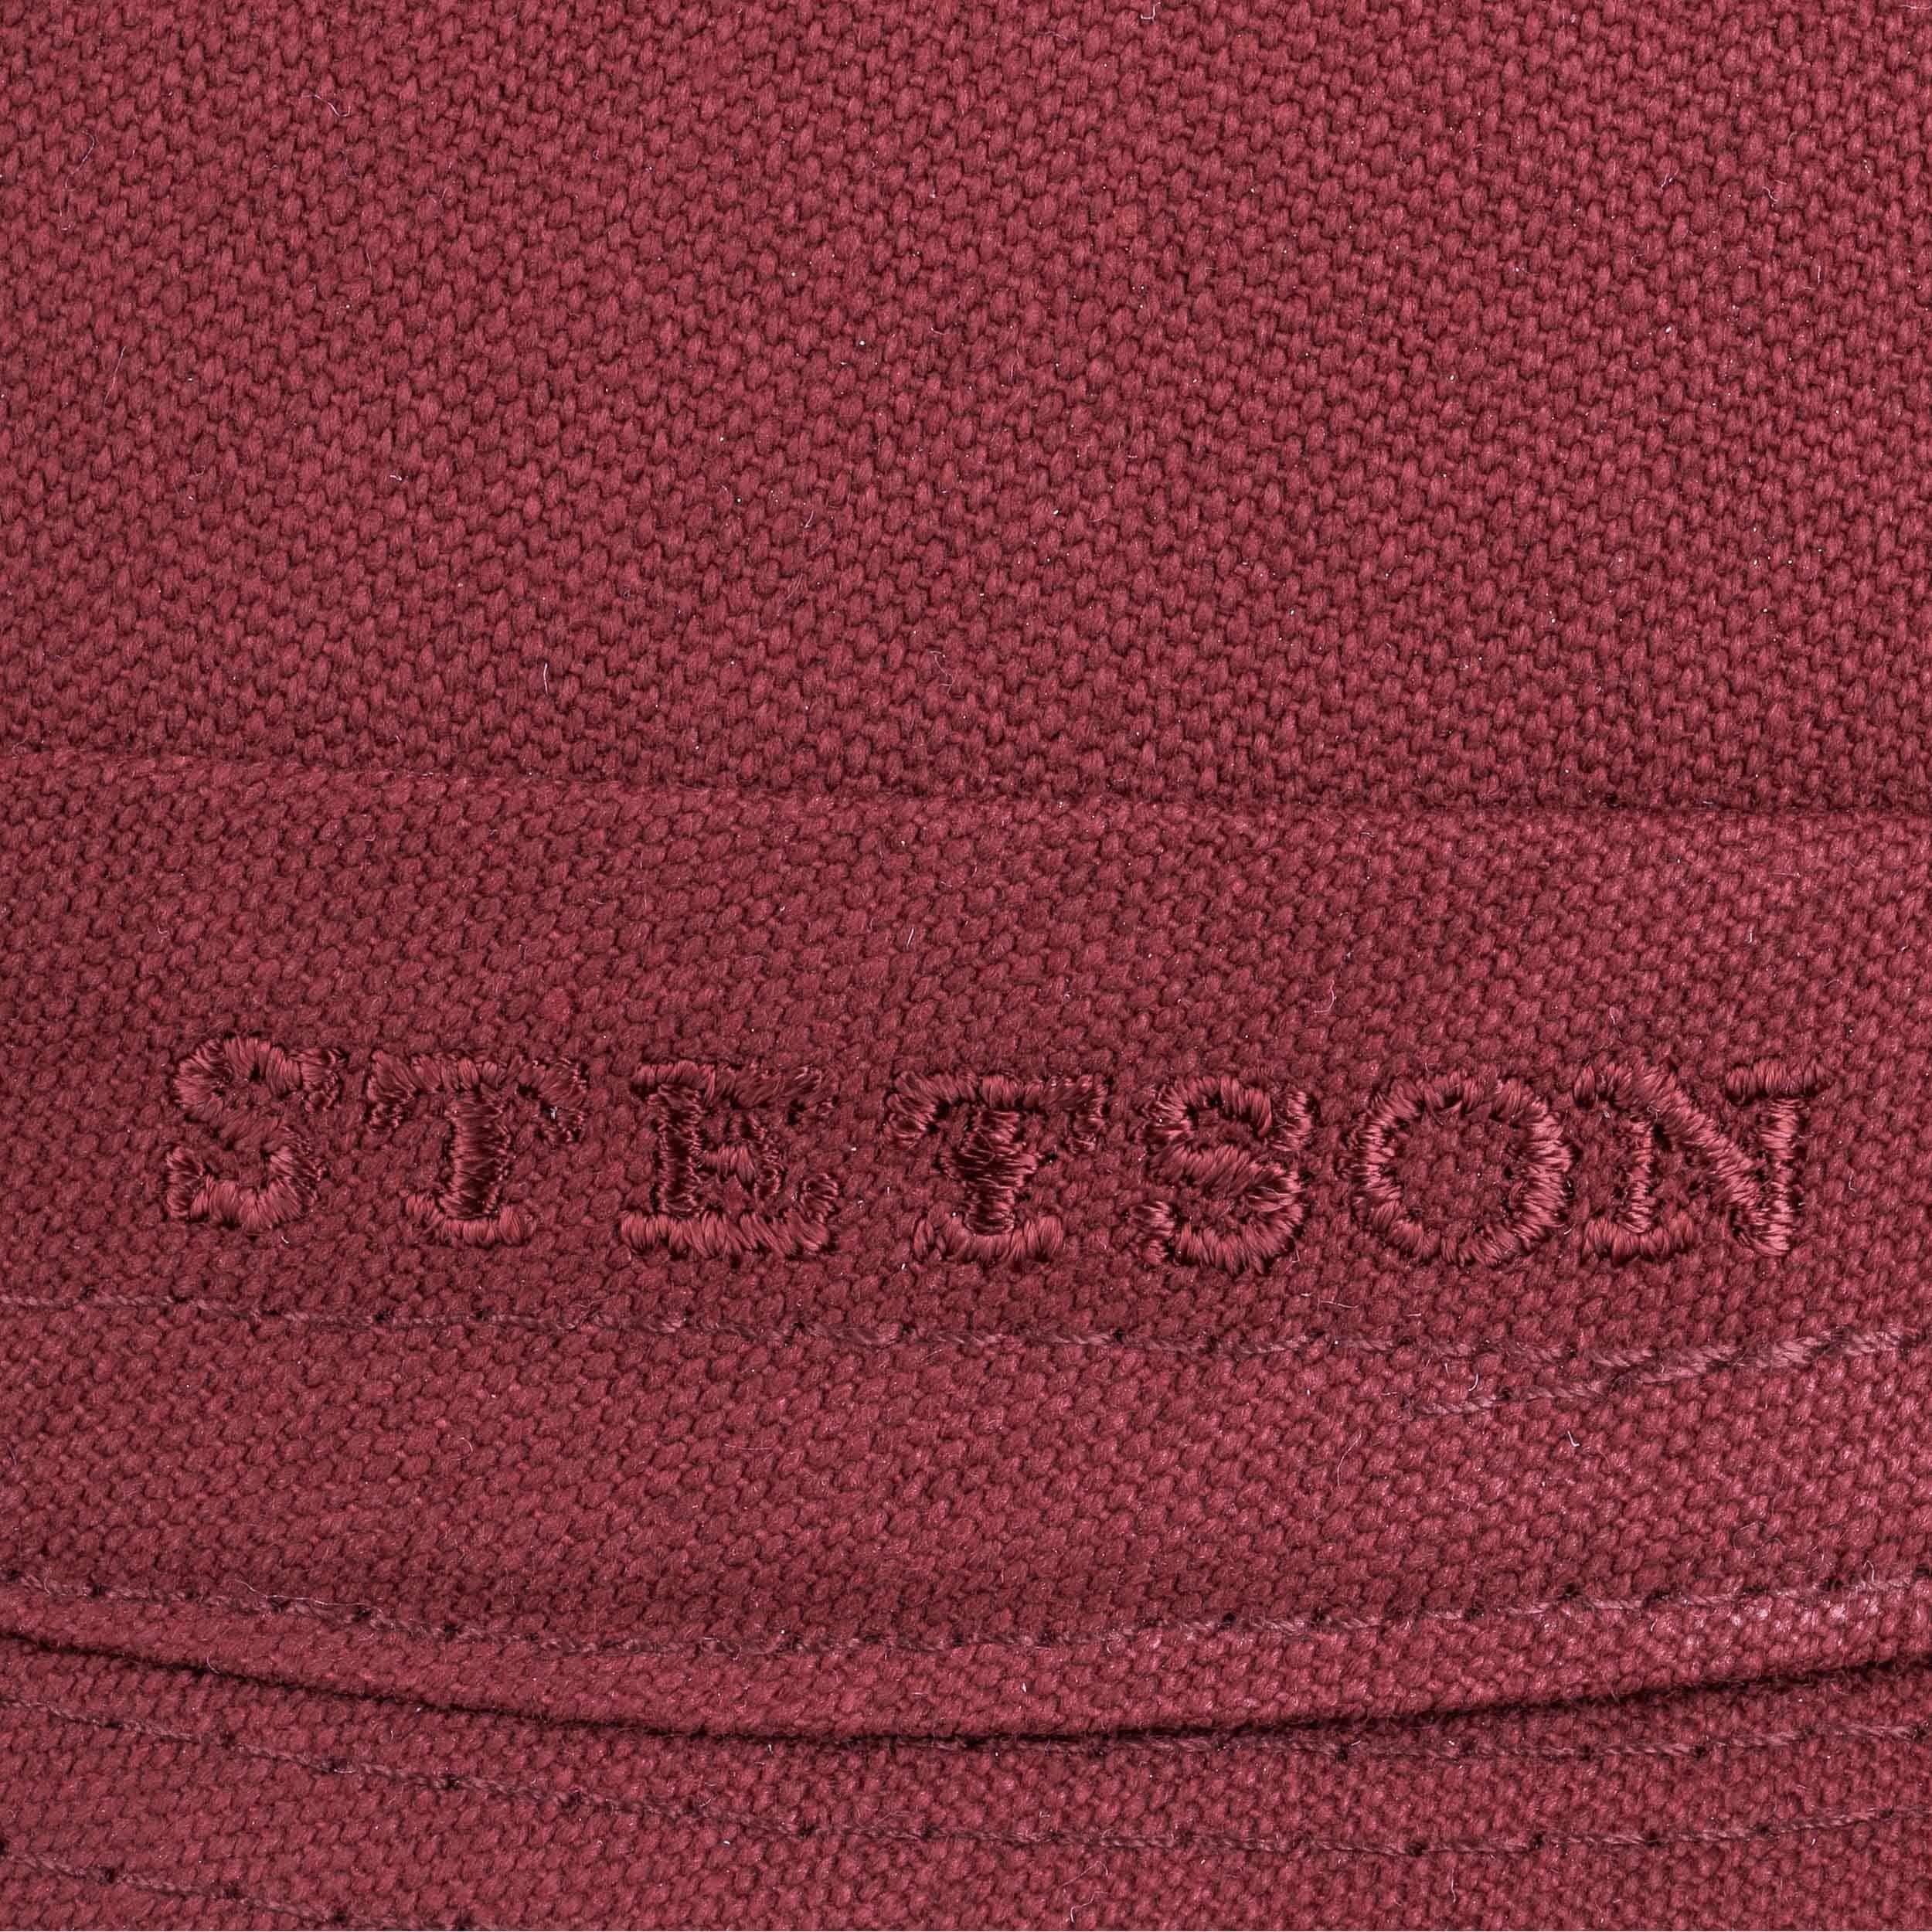 Teton Cloth Trilby Hat dark red